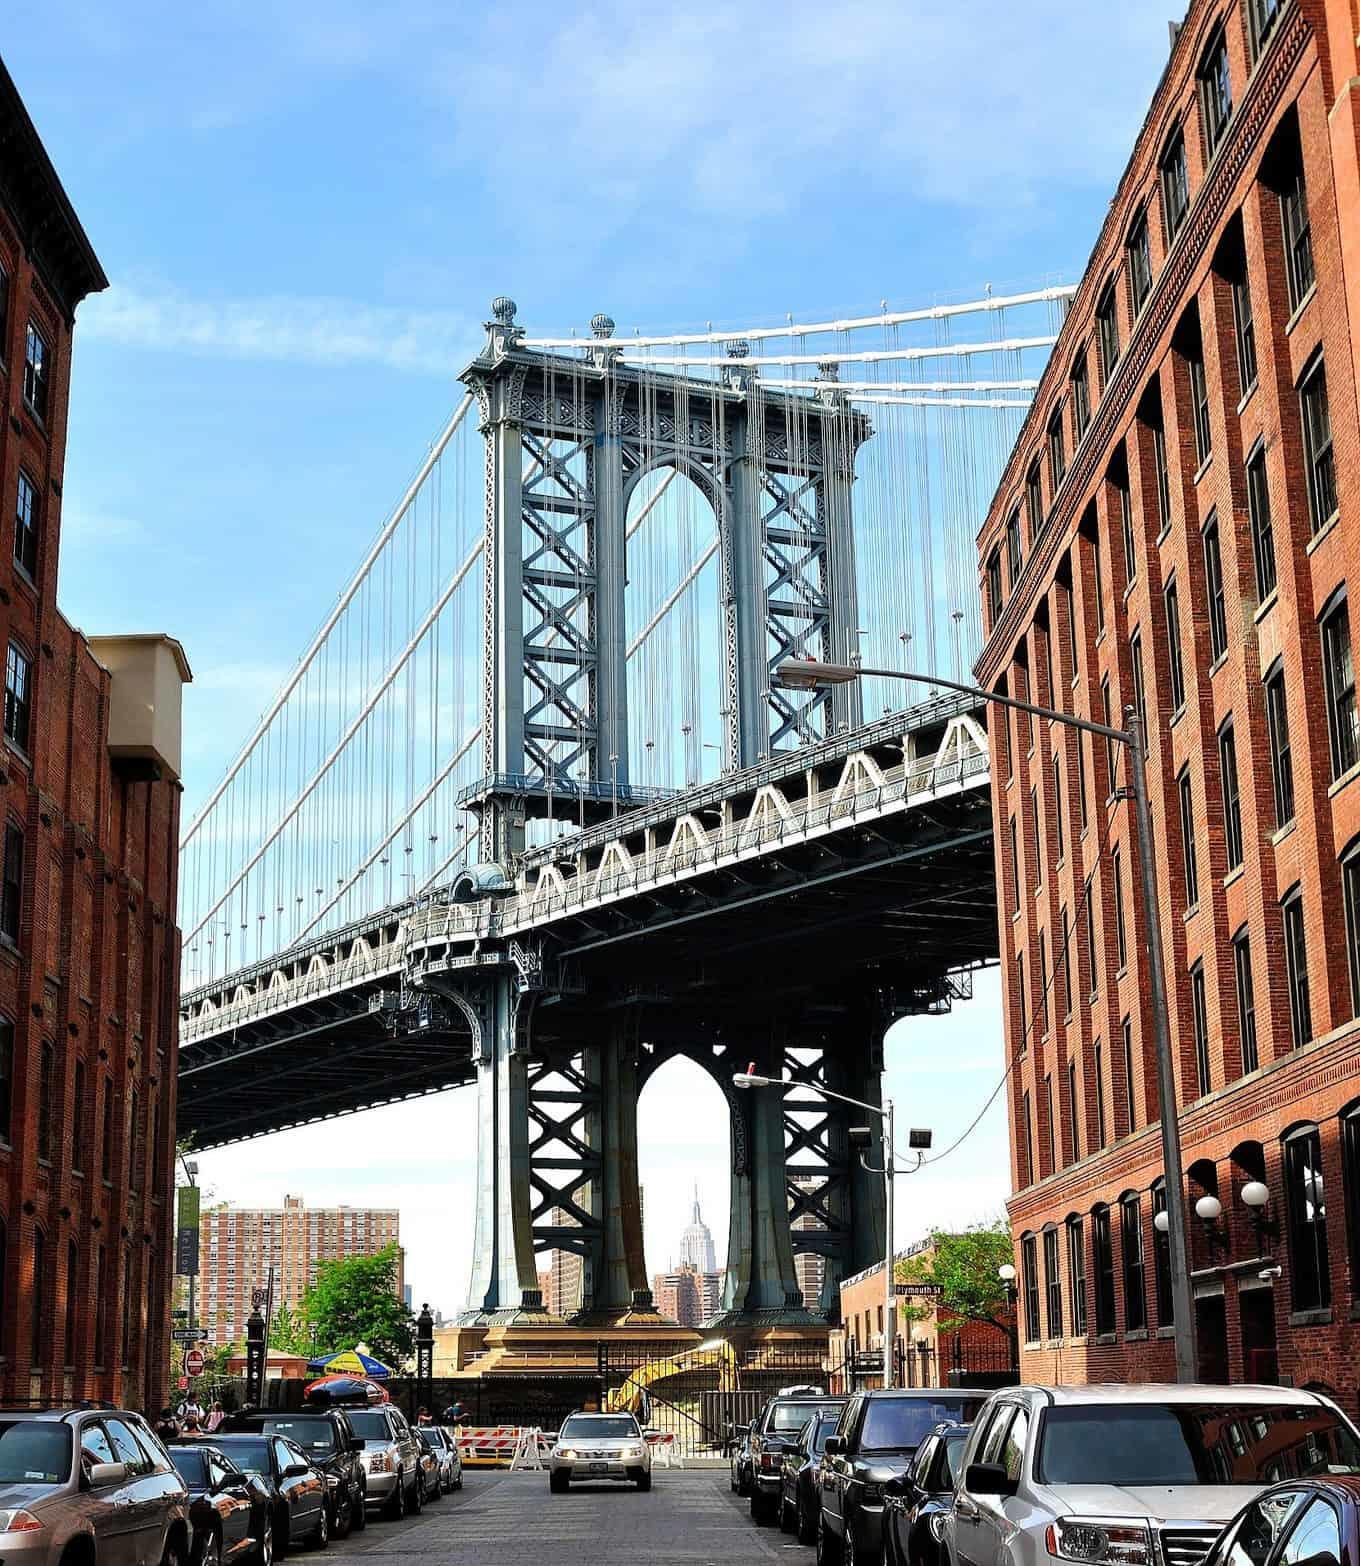 decouvrir-vivre-investir-quartier-dumbo-brooklyn-new-york